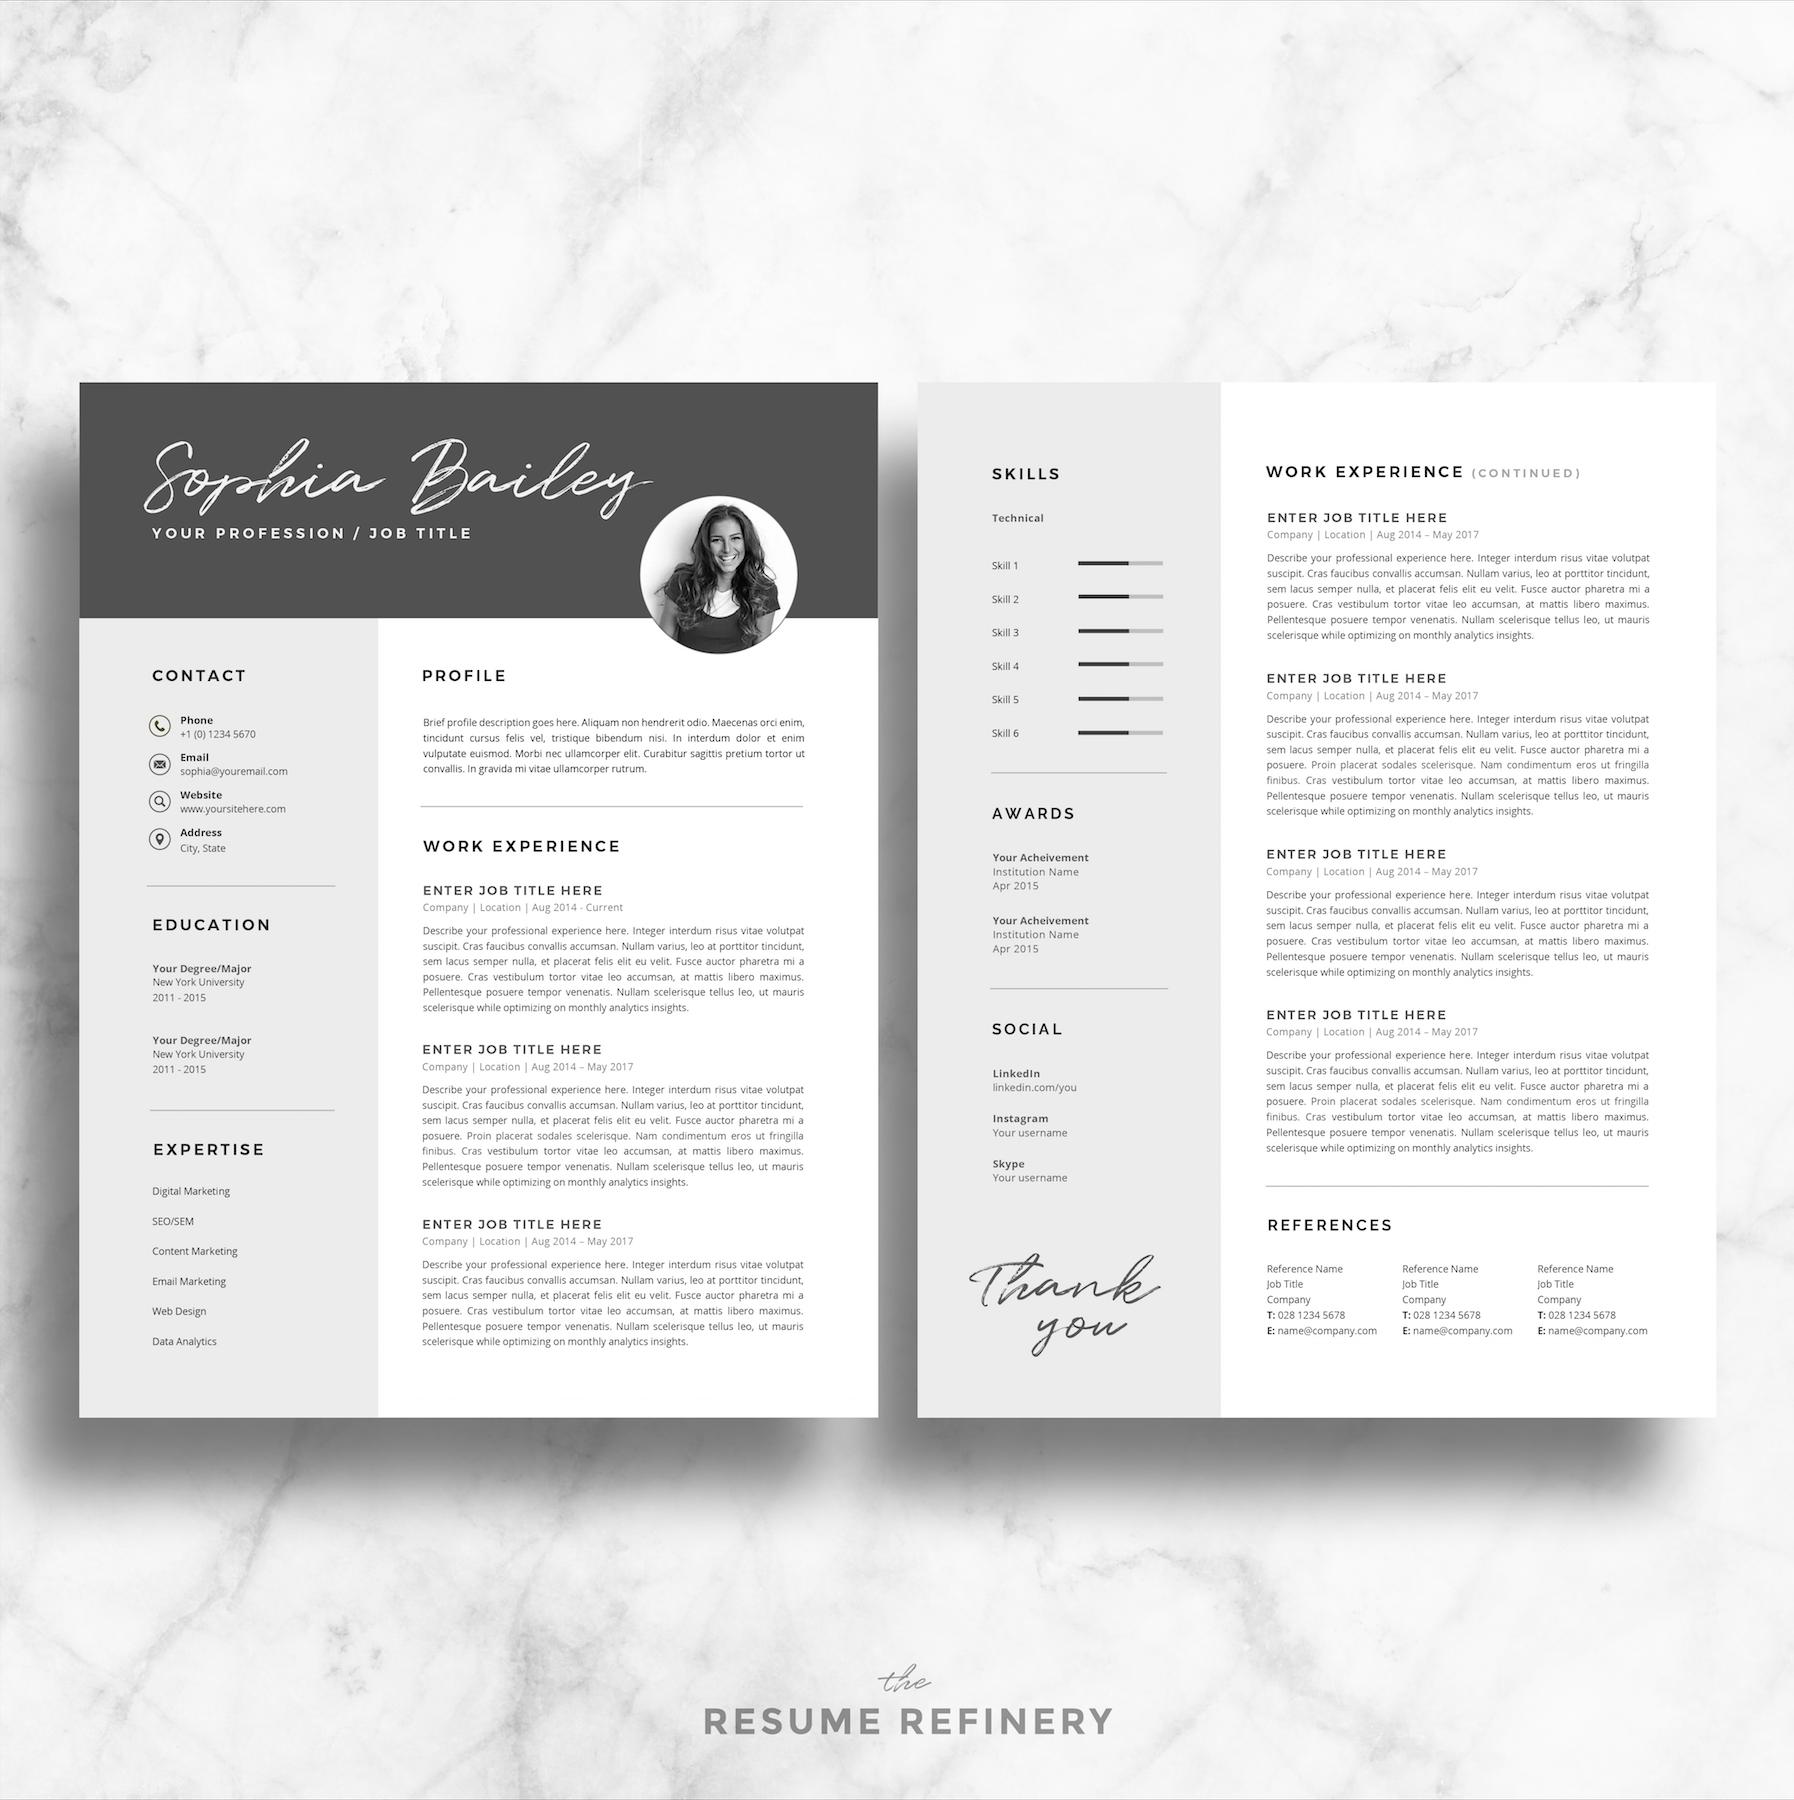 Bonus Letter Template Unique Professional 2 Page Resume  Cover Letter Template For Word  Bonus .